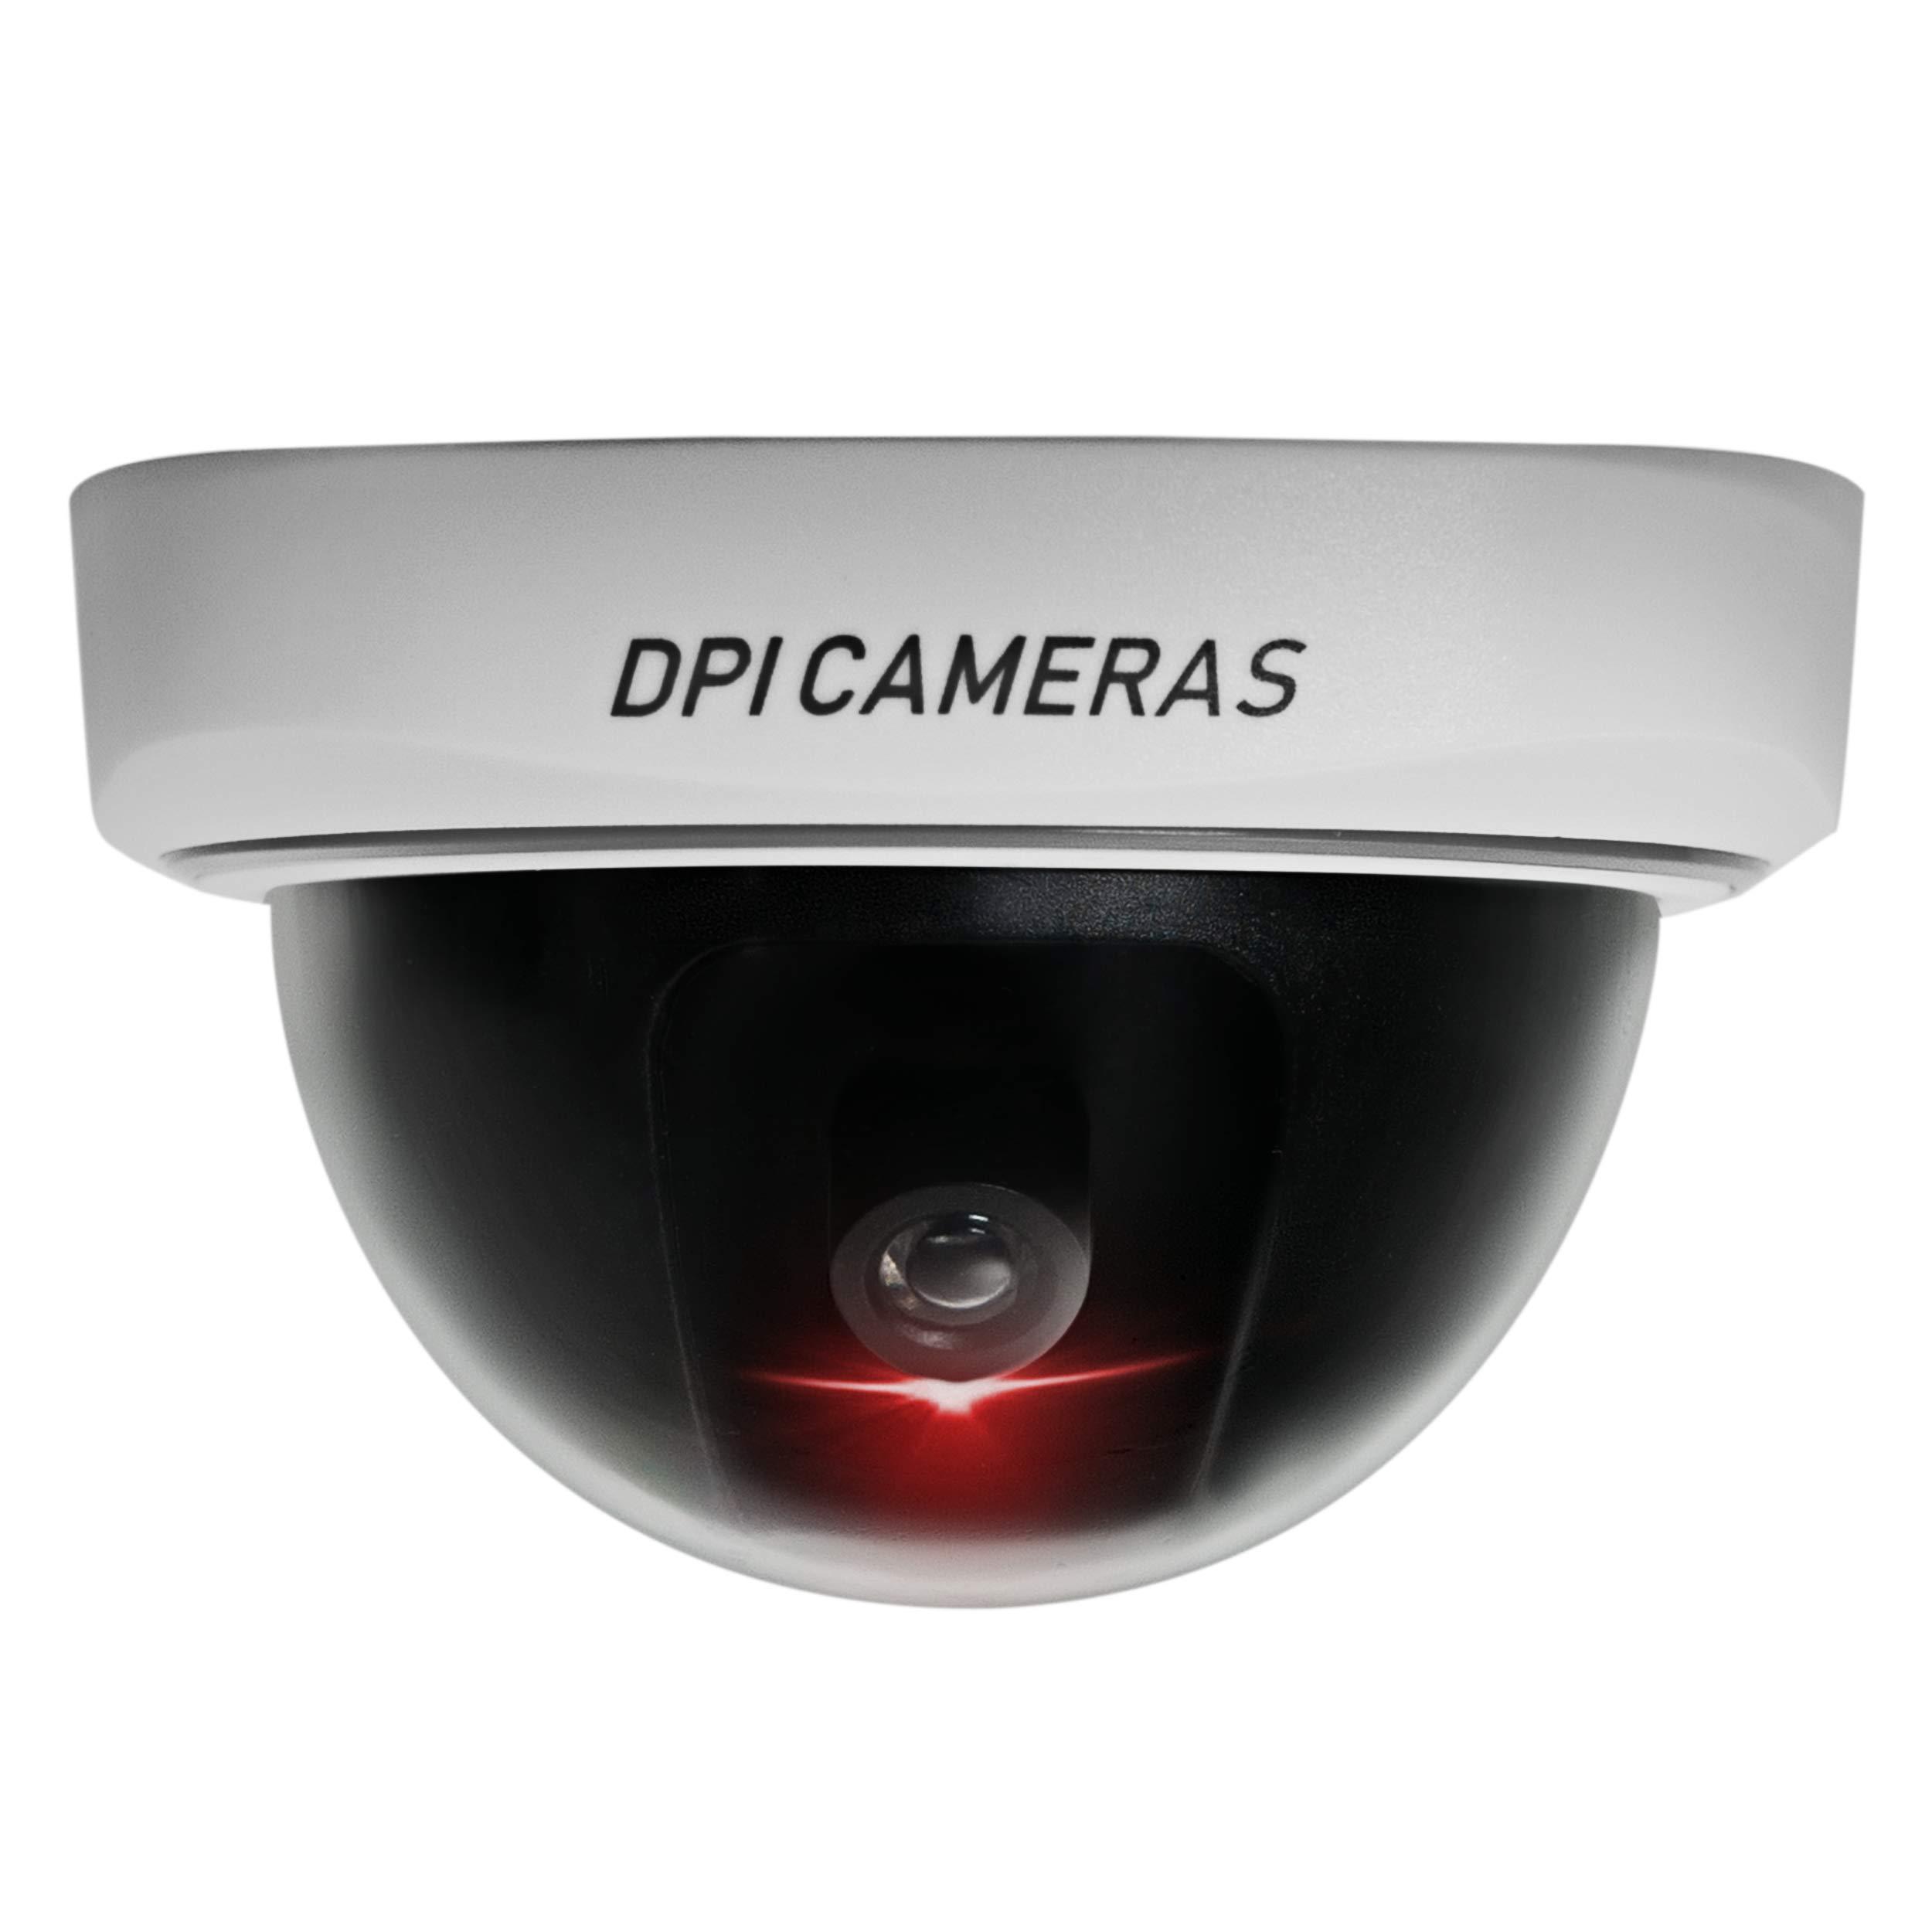 DPI Fake Security Camera 4 Pack Authentic Look Dummy Fake Camera Security Dummy Fake Surveillance Dummy Fake Security Cameras CCTV Dome Camera Recording Flashing Warning Red led Light Black White